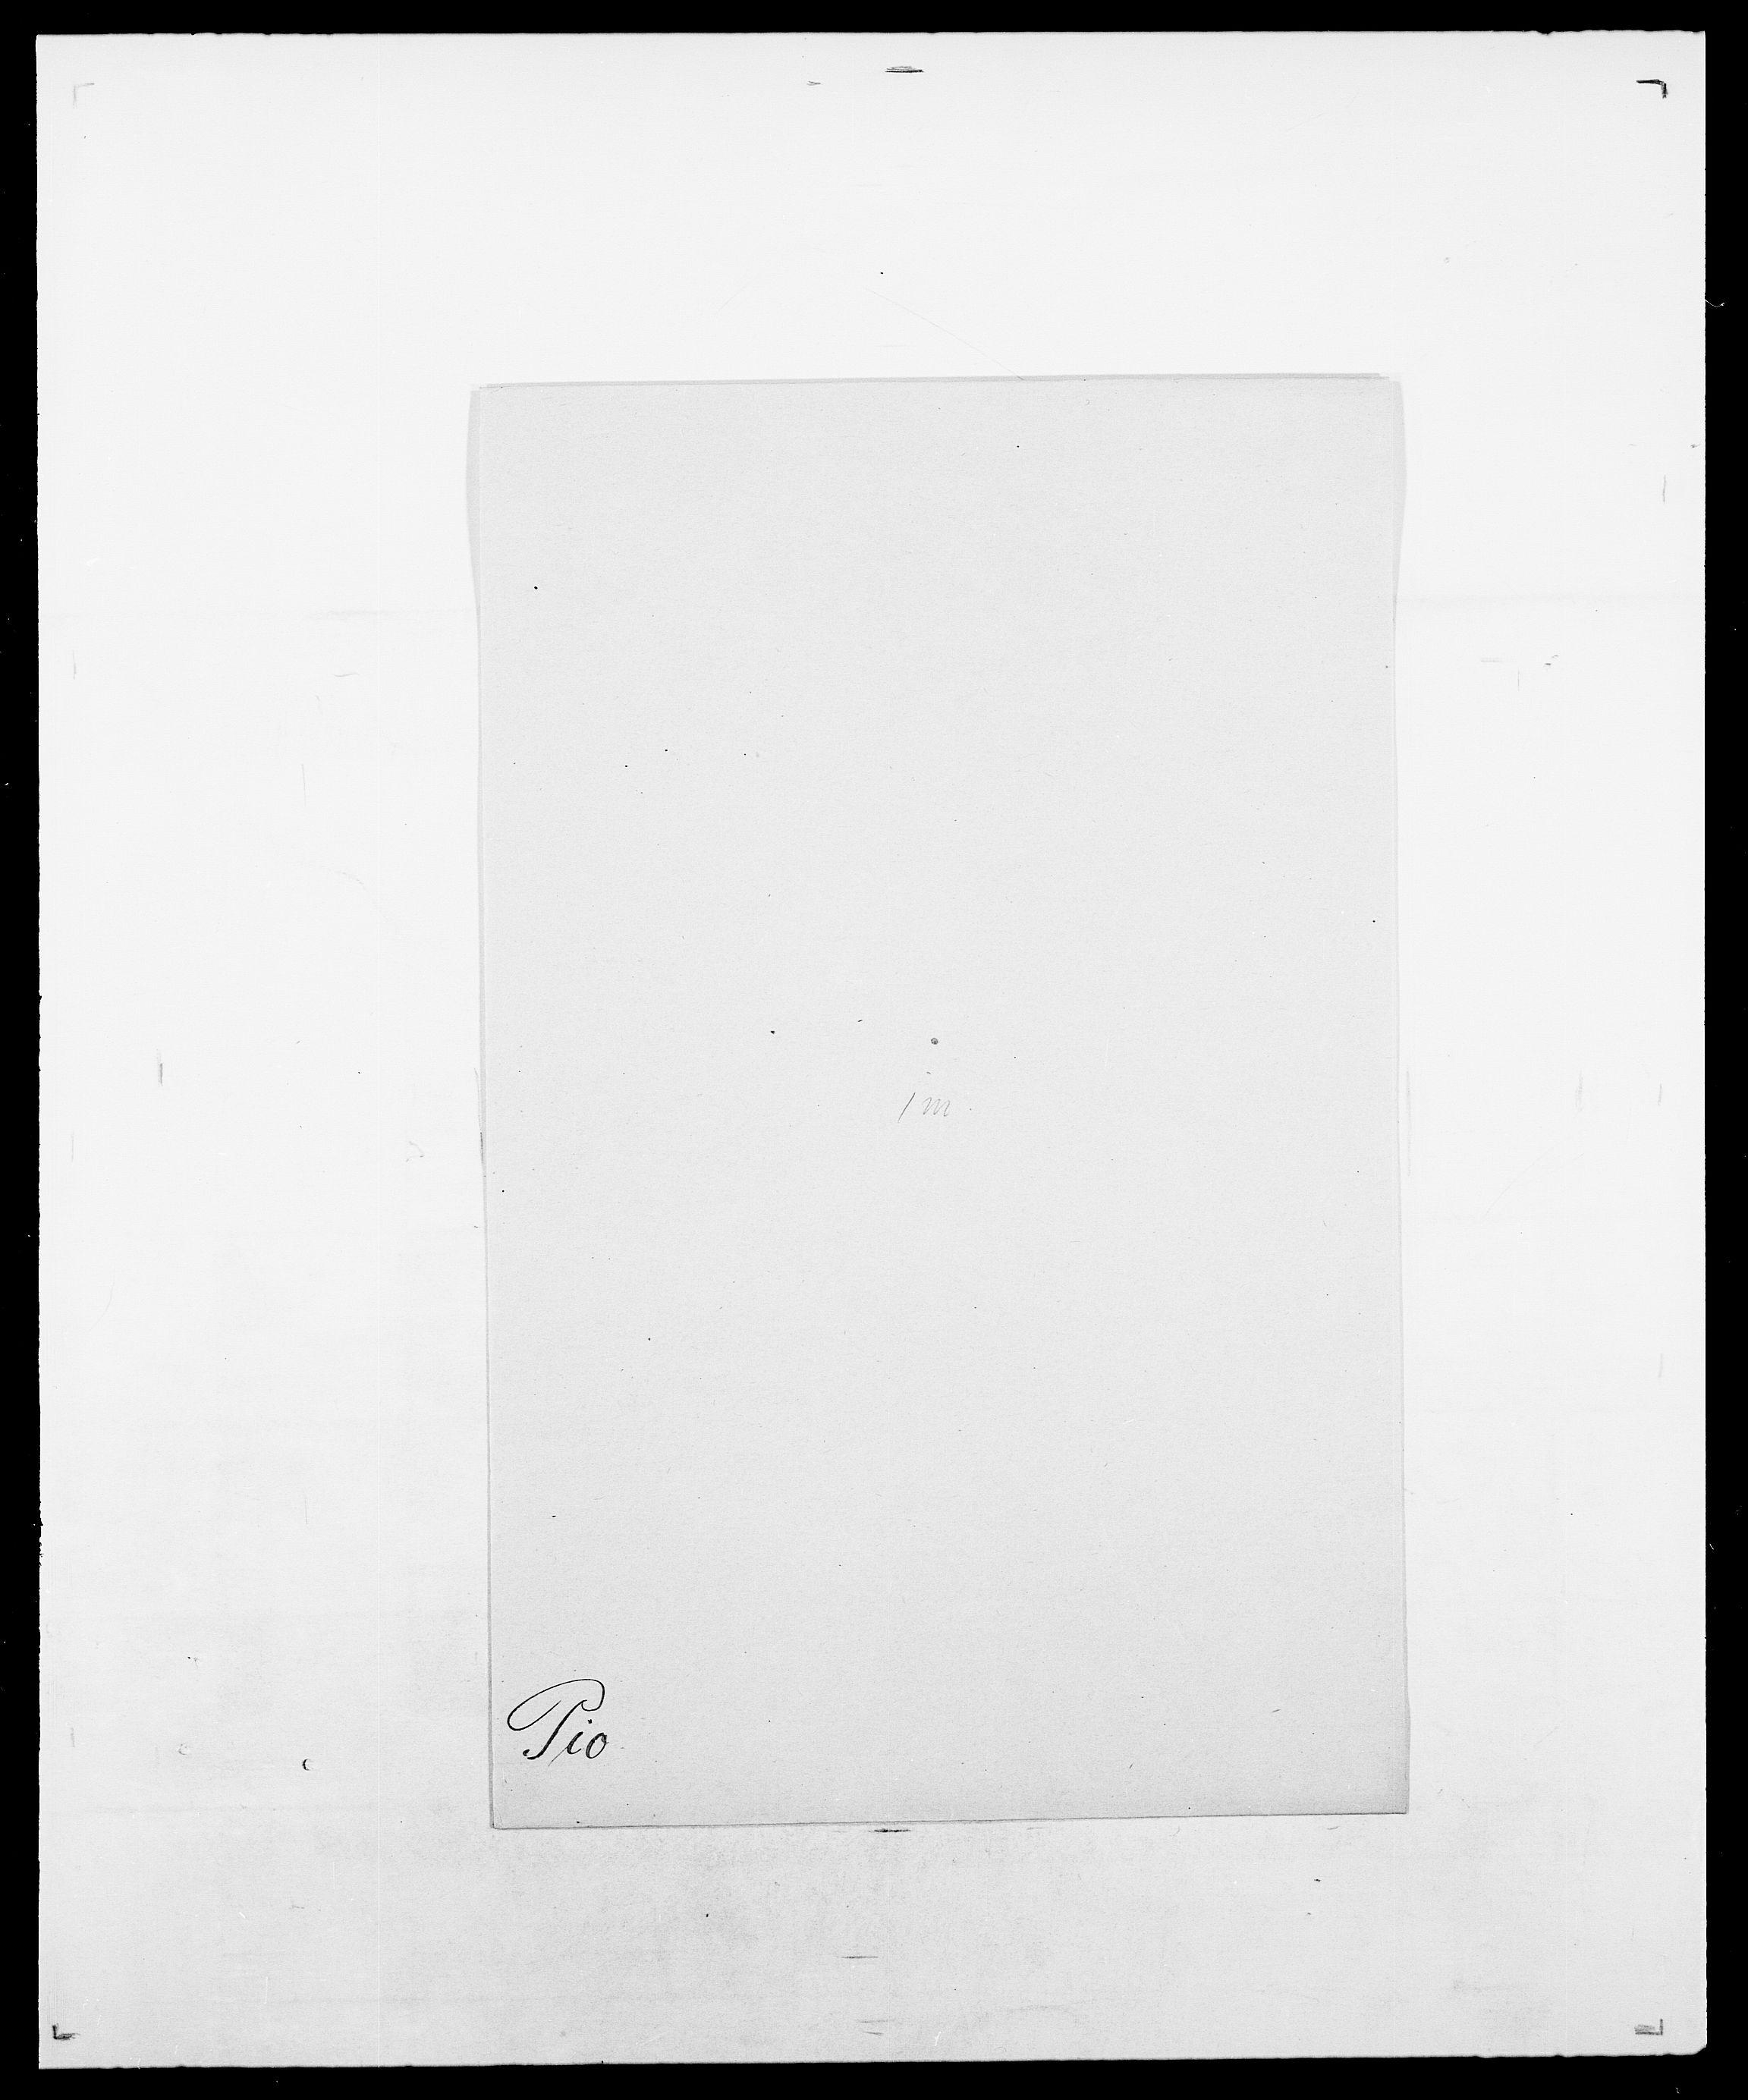 SAO, Delgobe, Charles Antoine - samling, D/Da/L0030: Paars - Pittelkov, s. 559